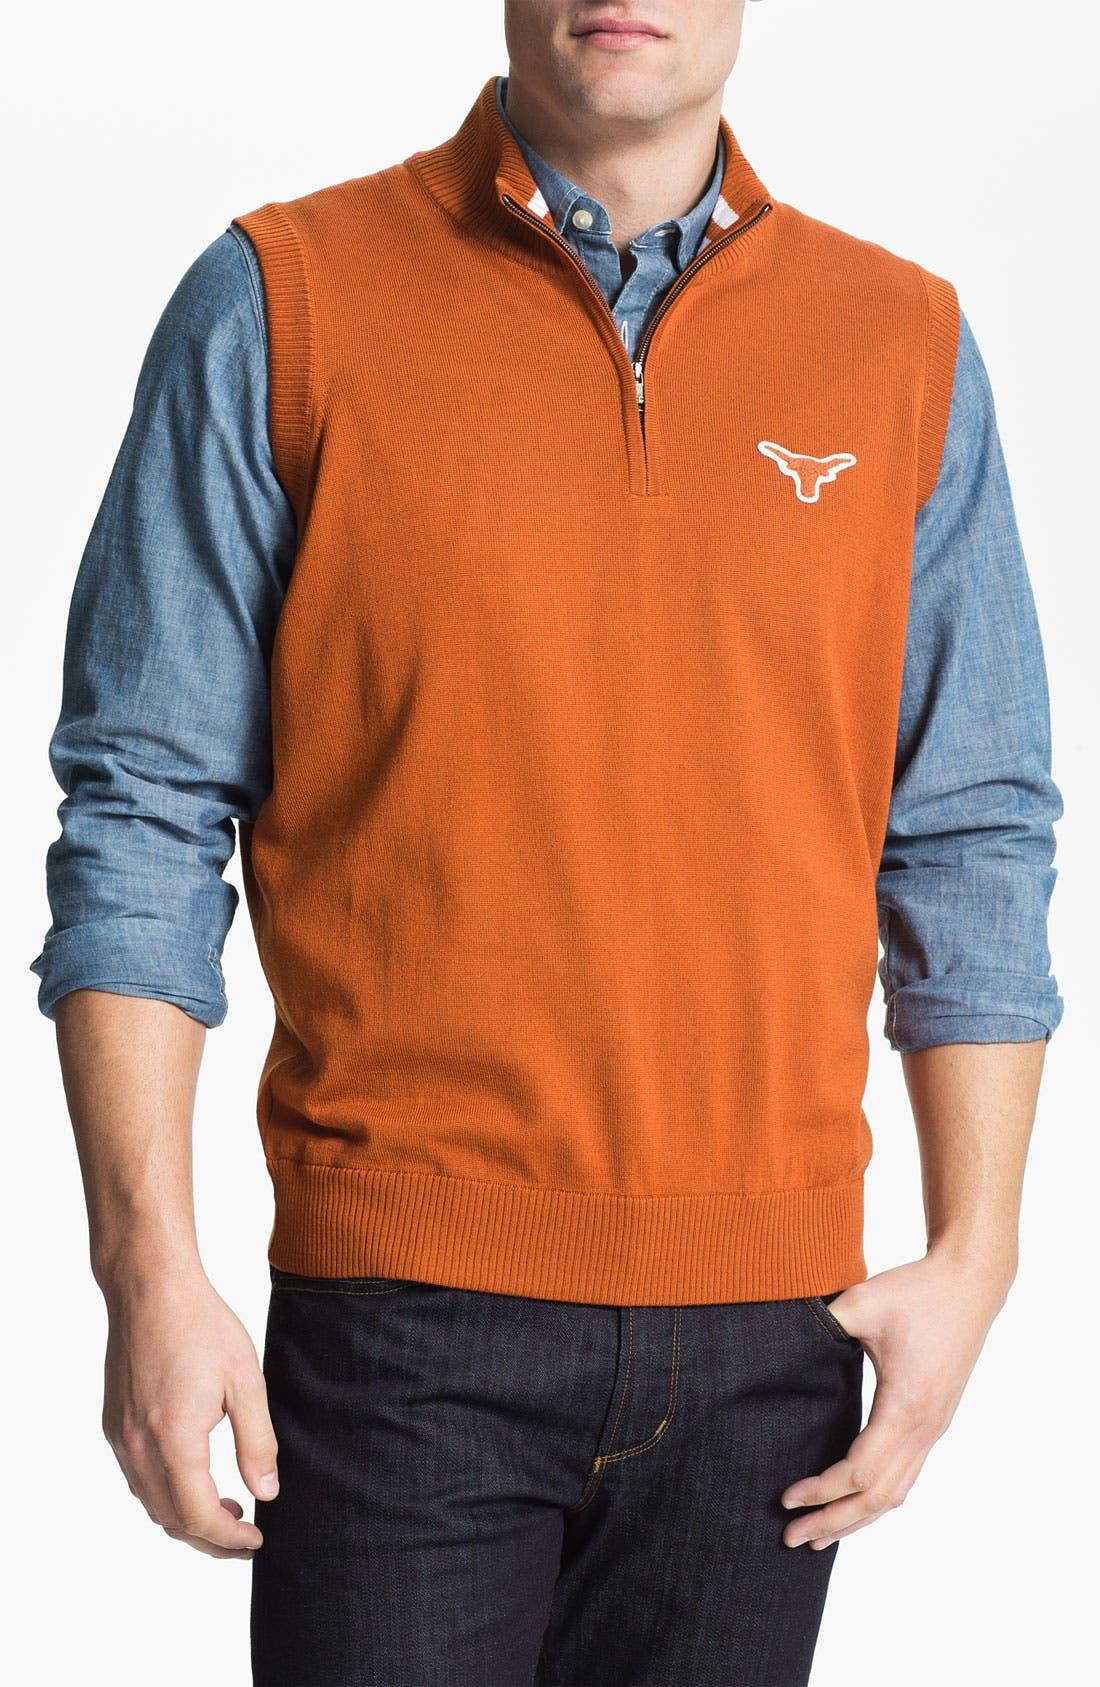 Main Image - Thomas Dean 'Texas' Quarter Zip Sweater Vest